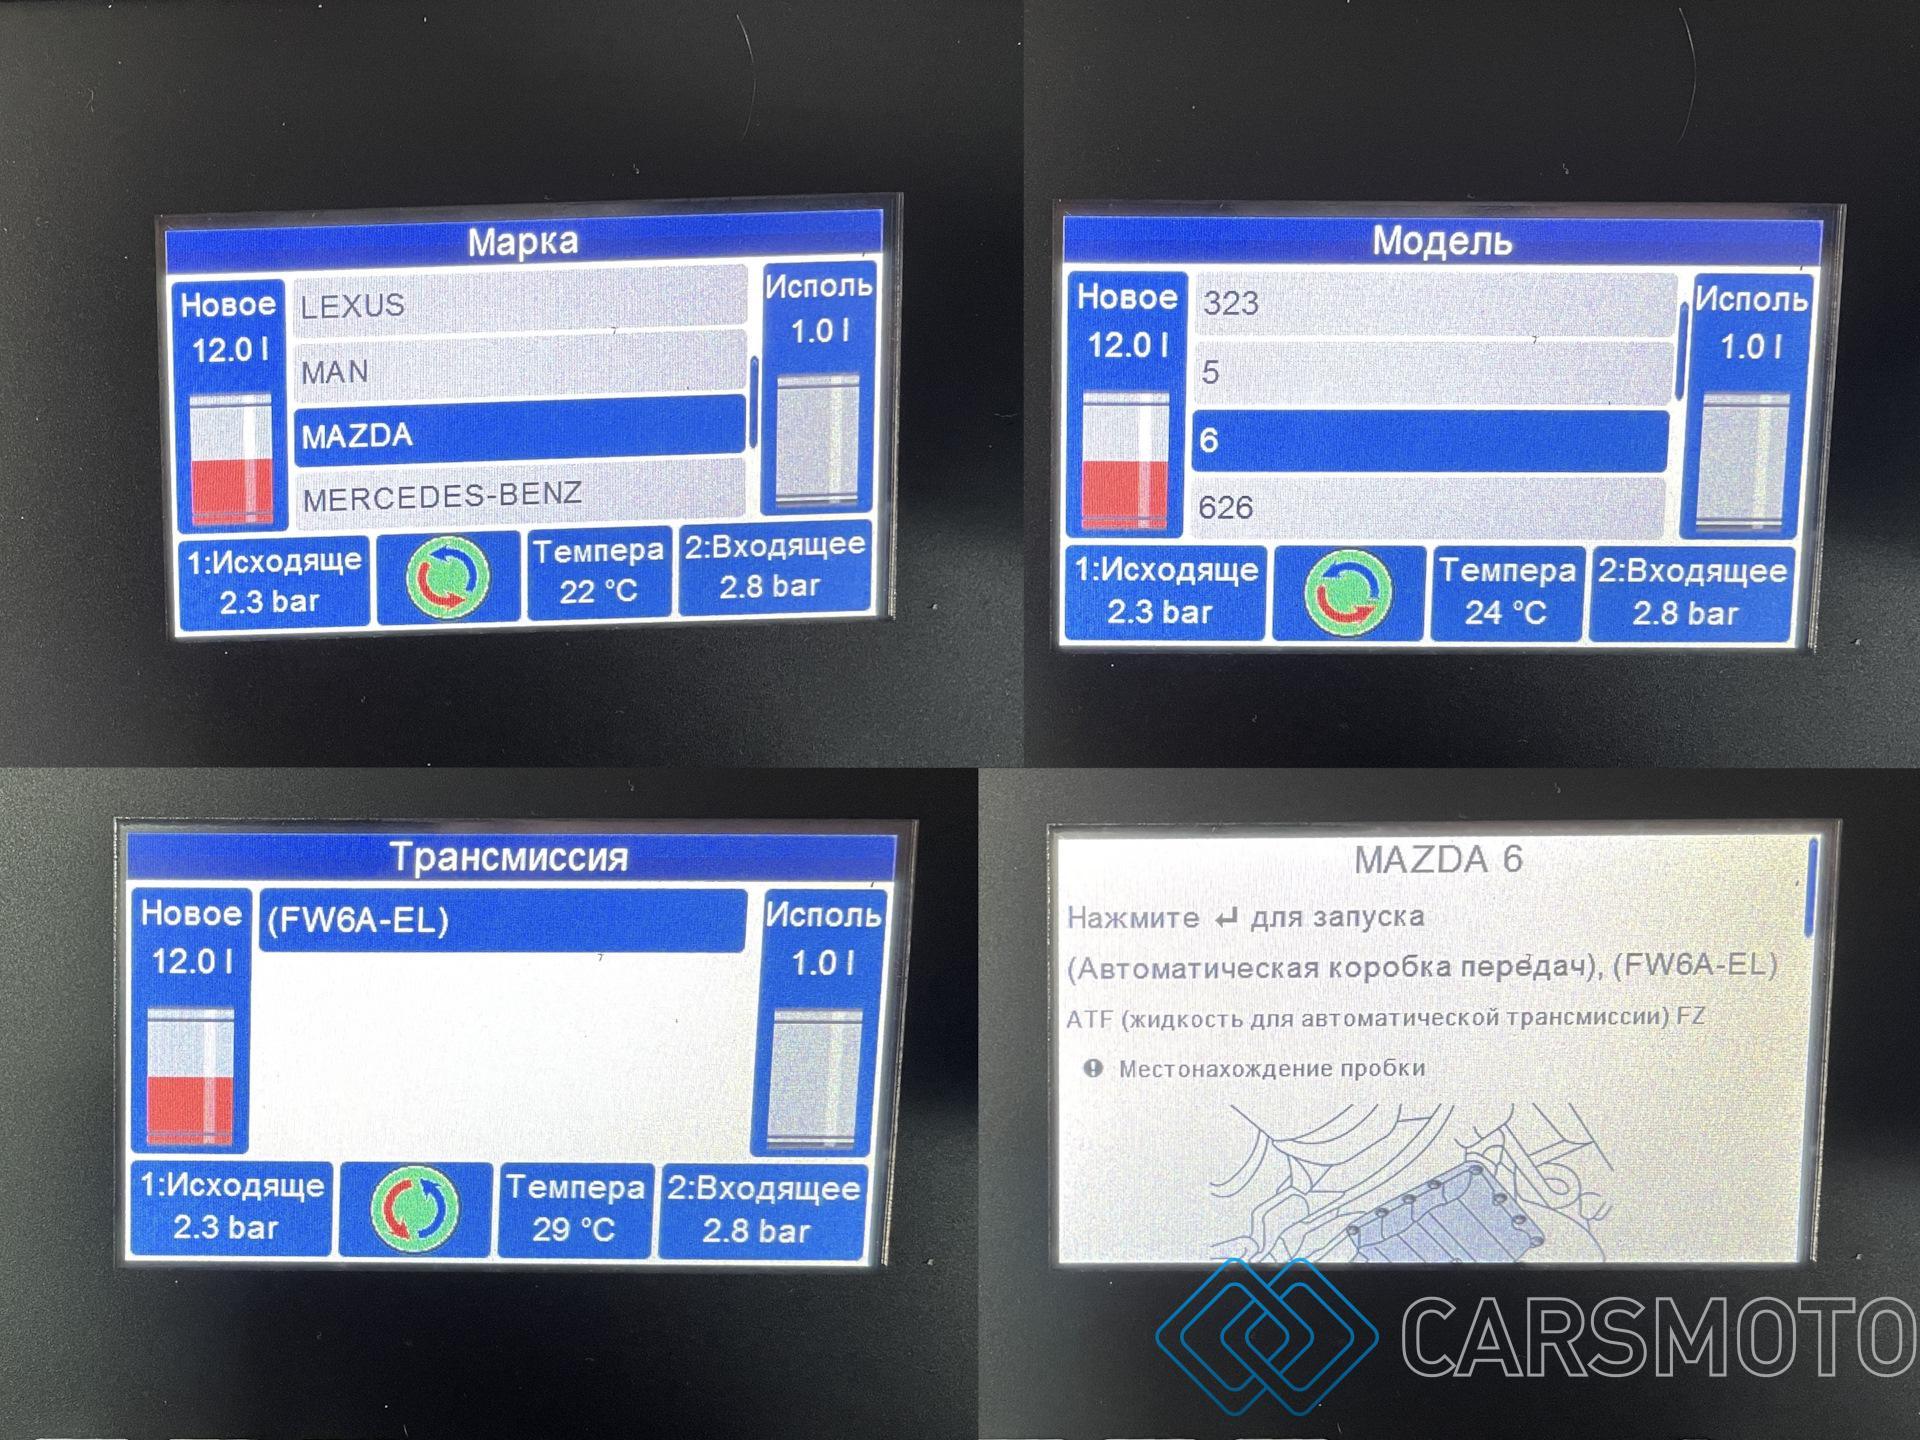 олная аппаратная замена масла АКПП Mazda 6 2.5T (GL)